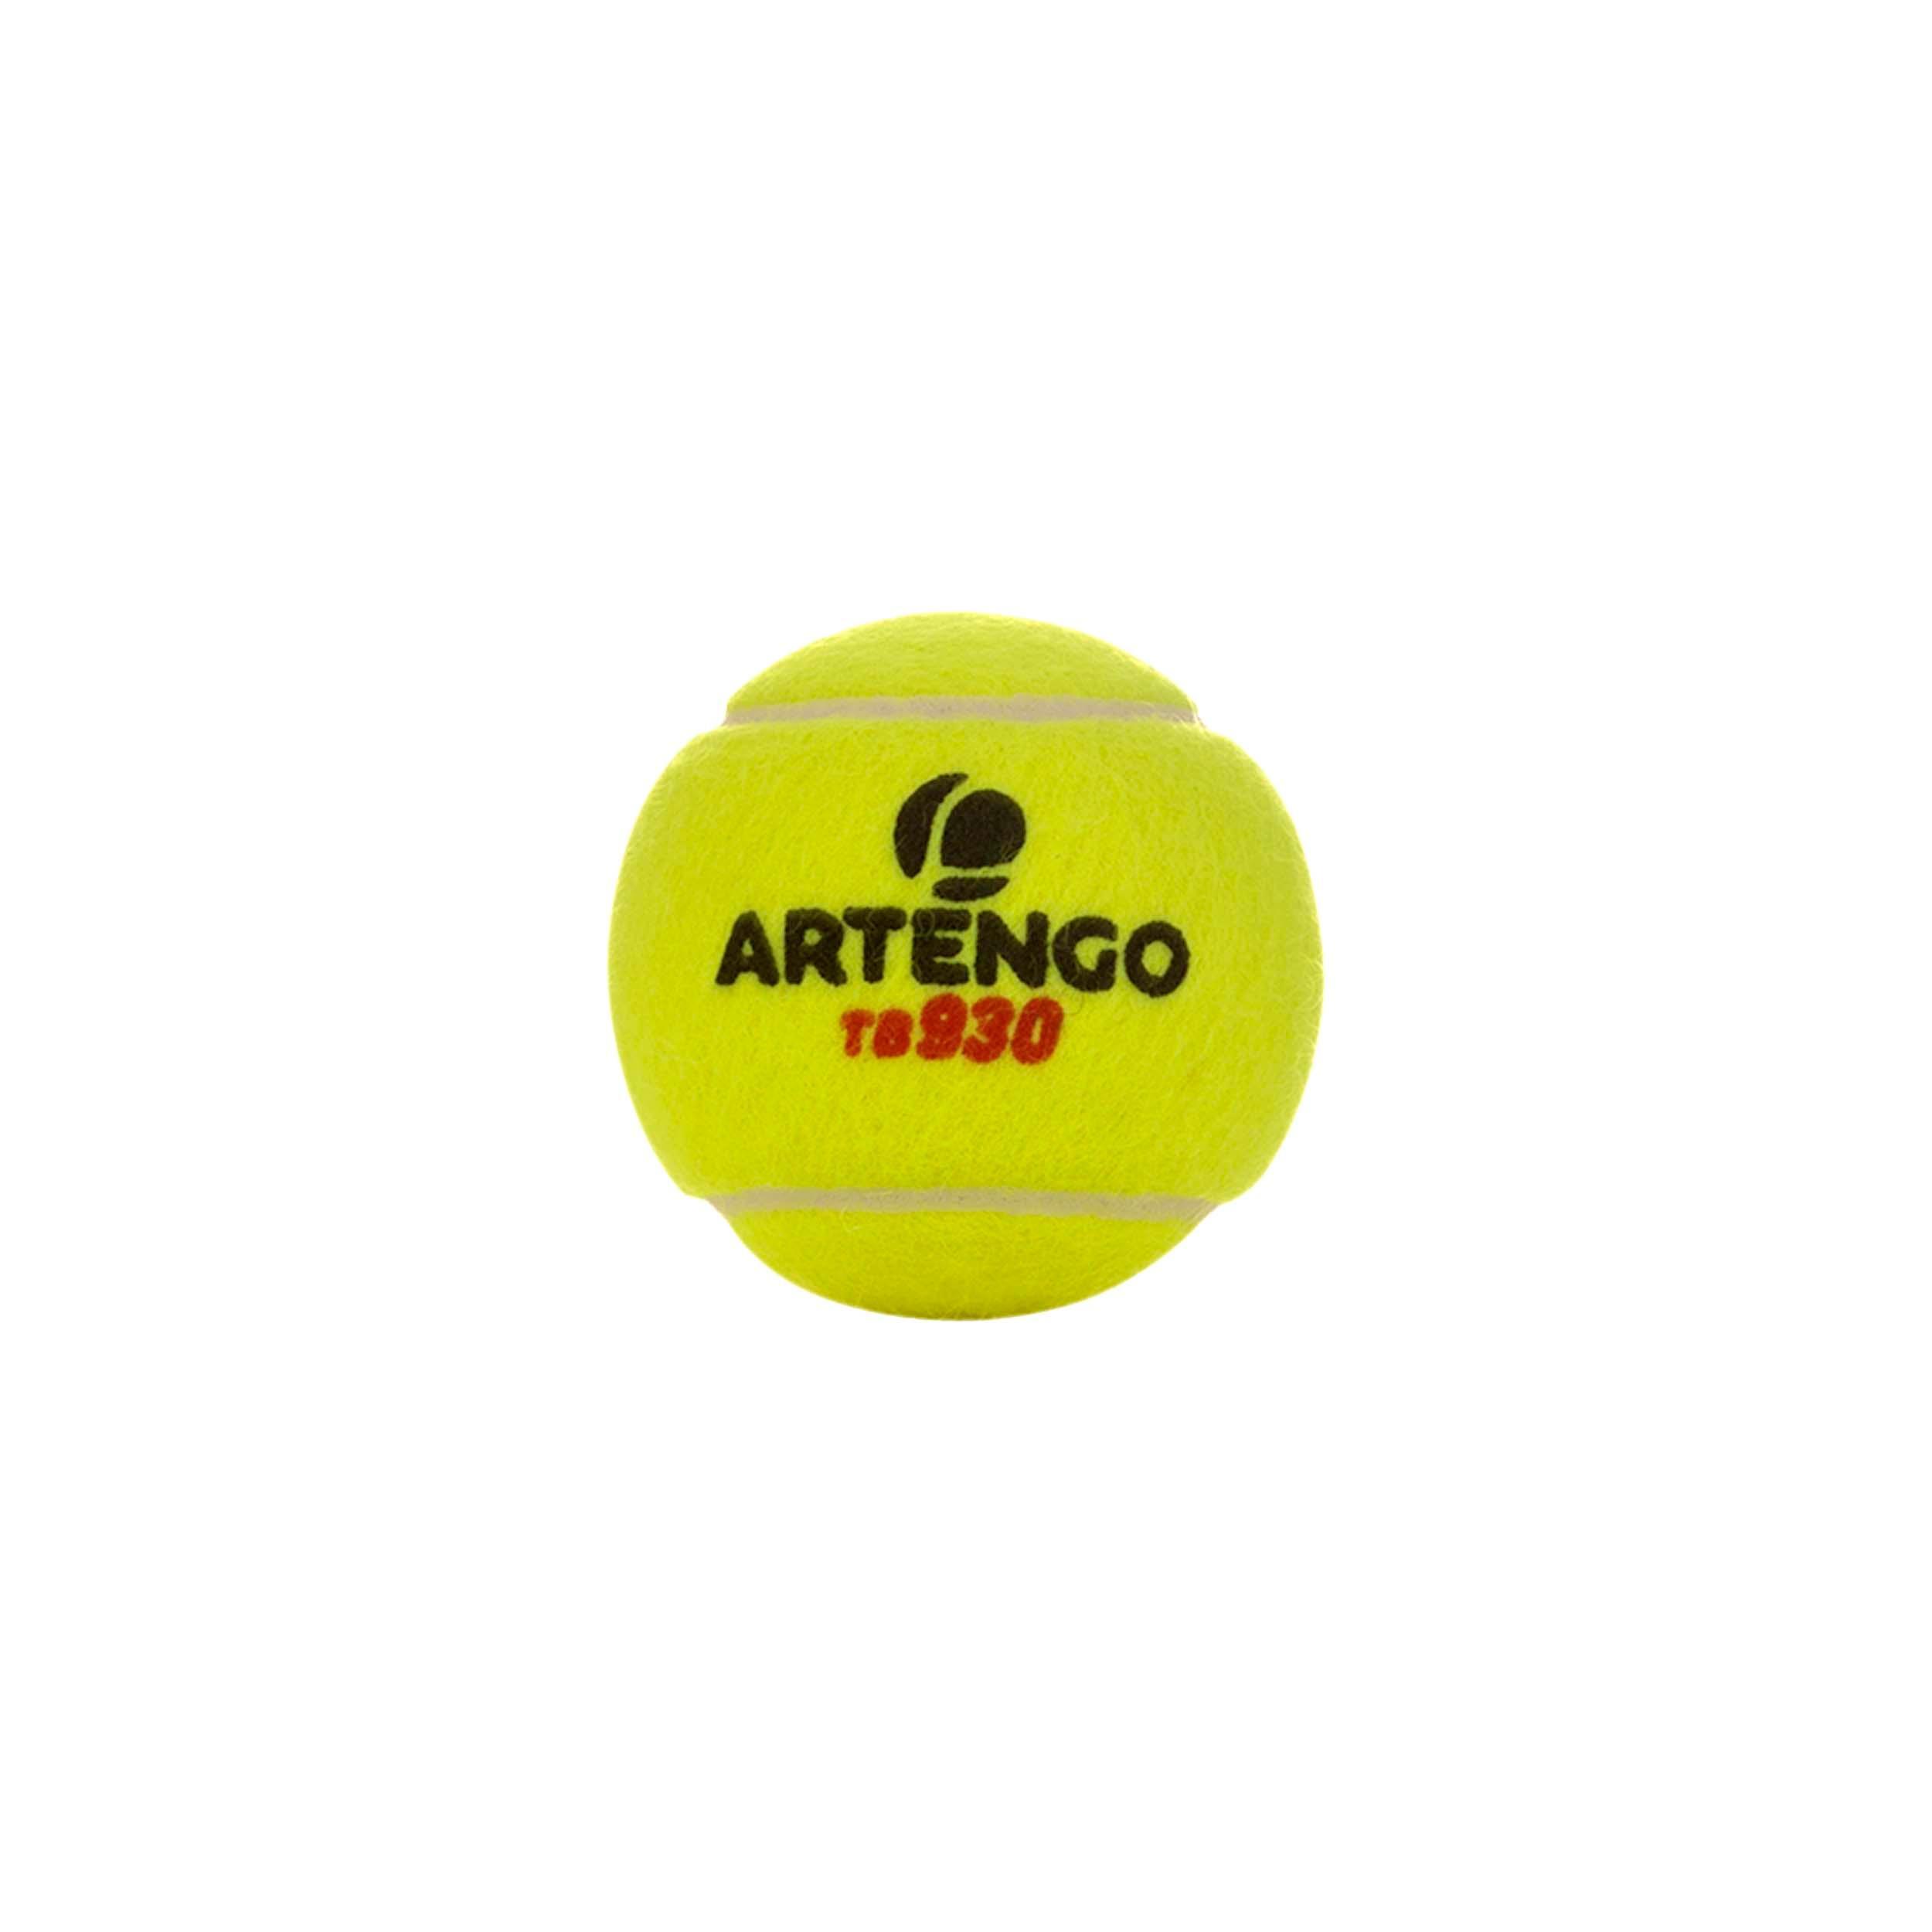 BALLE DE TENNIS PRESSION TB 930 *4 JAUNE